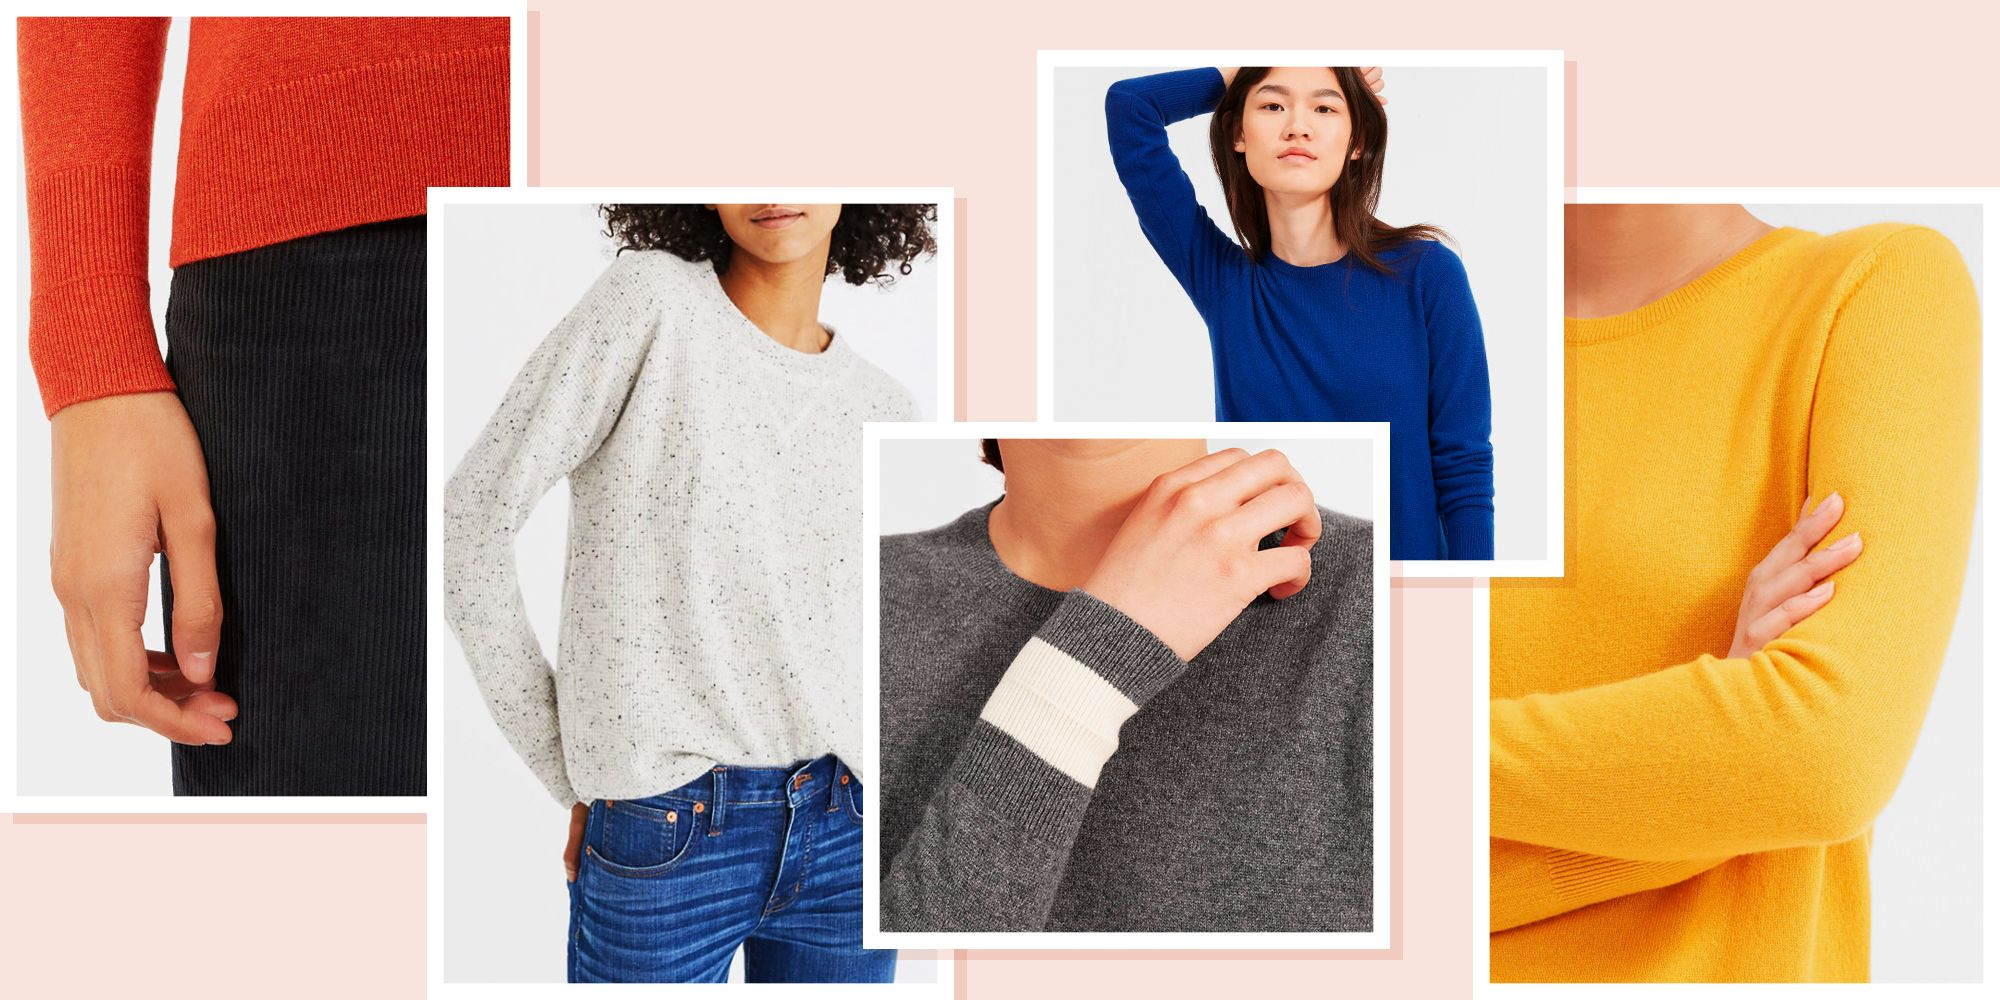 495cf3ffe70 8 Best Cashmere Sweaters for Women 2018 - Softest Cashmere Sweaters